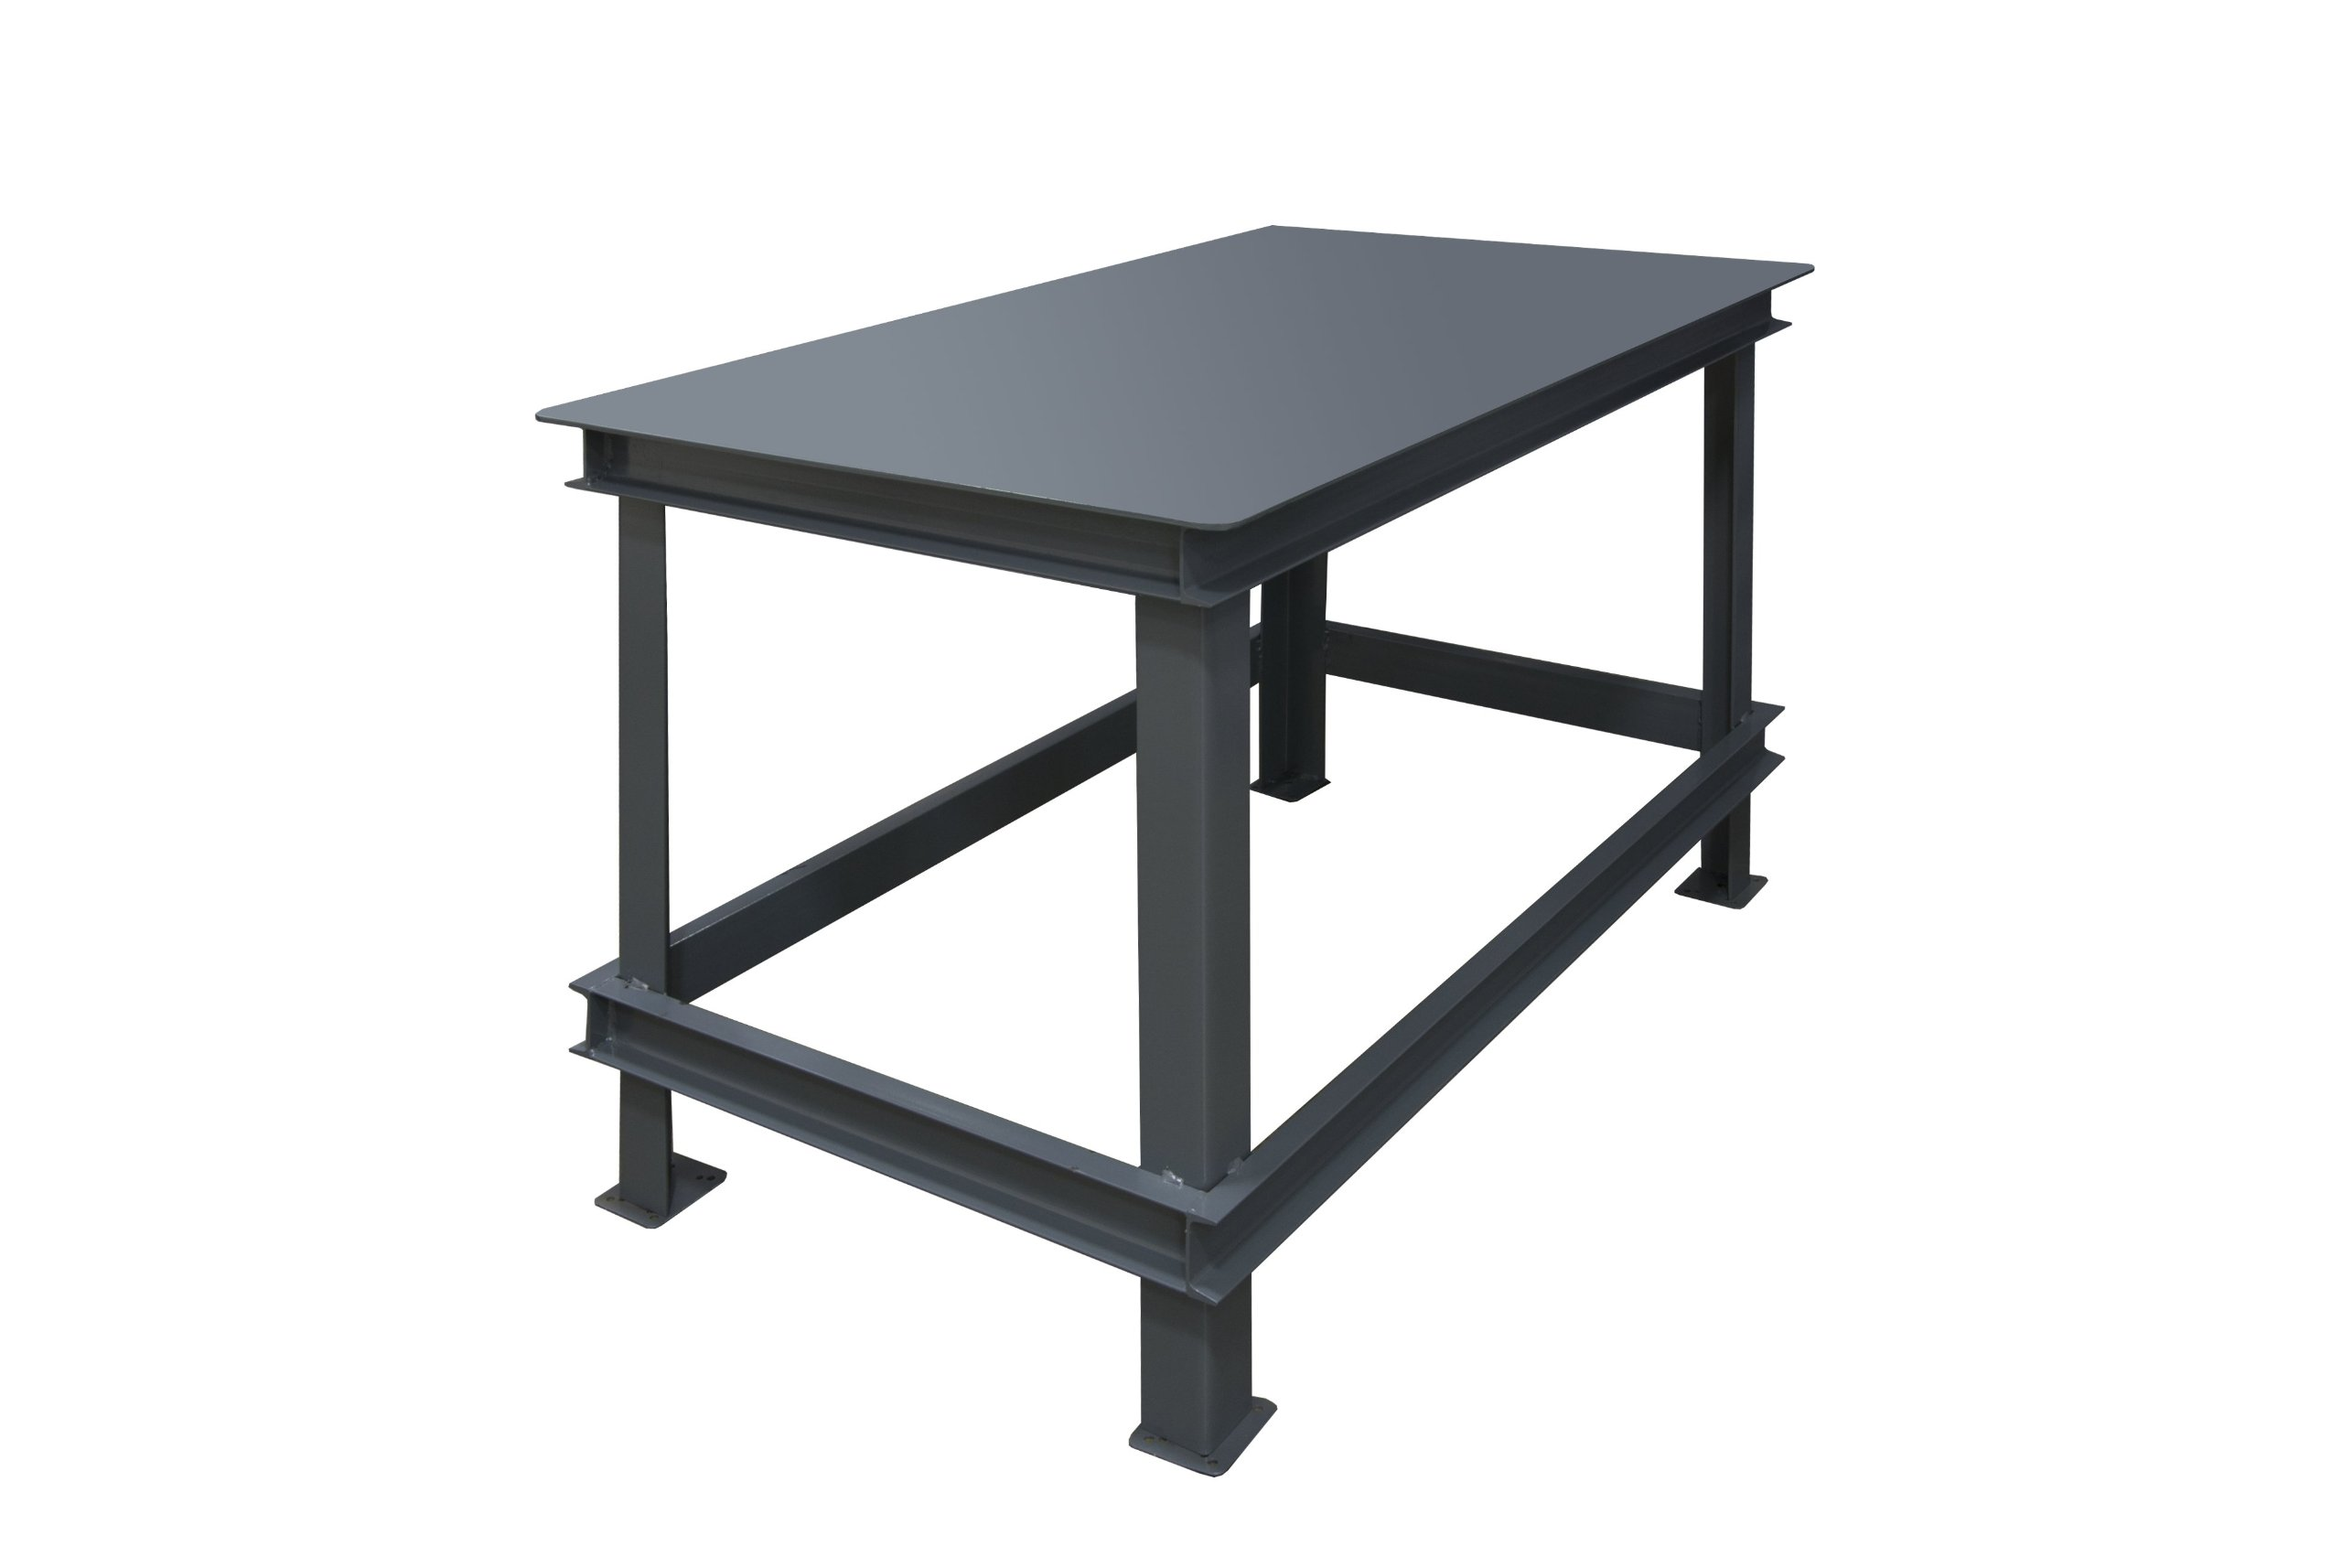 Durham Steel Extra Heavy Duty Machine Table, HWBMT-367234-95,  1 Shelves,  14000 lbs Capacity,  36'' Length x 72'' Width x 34'' Height